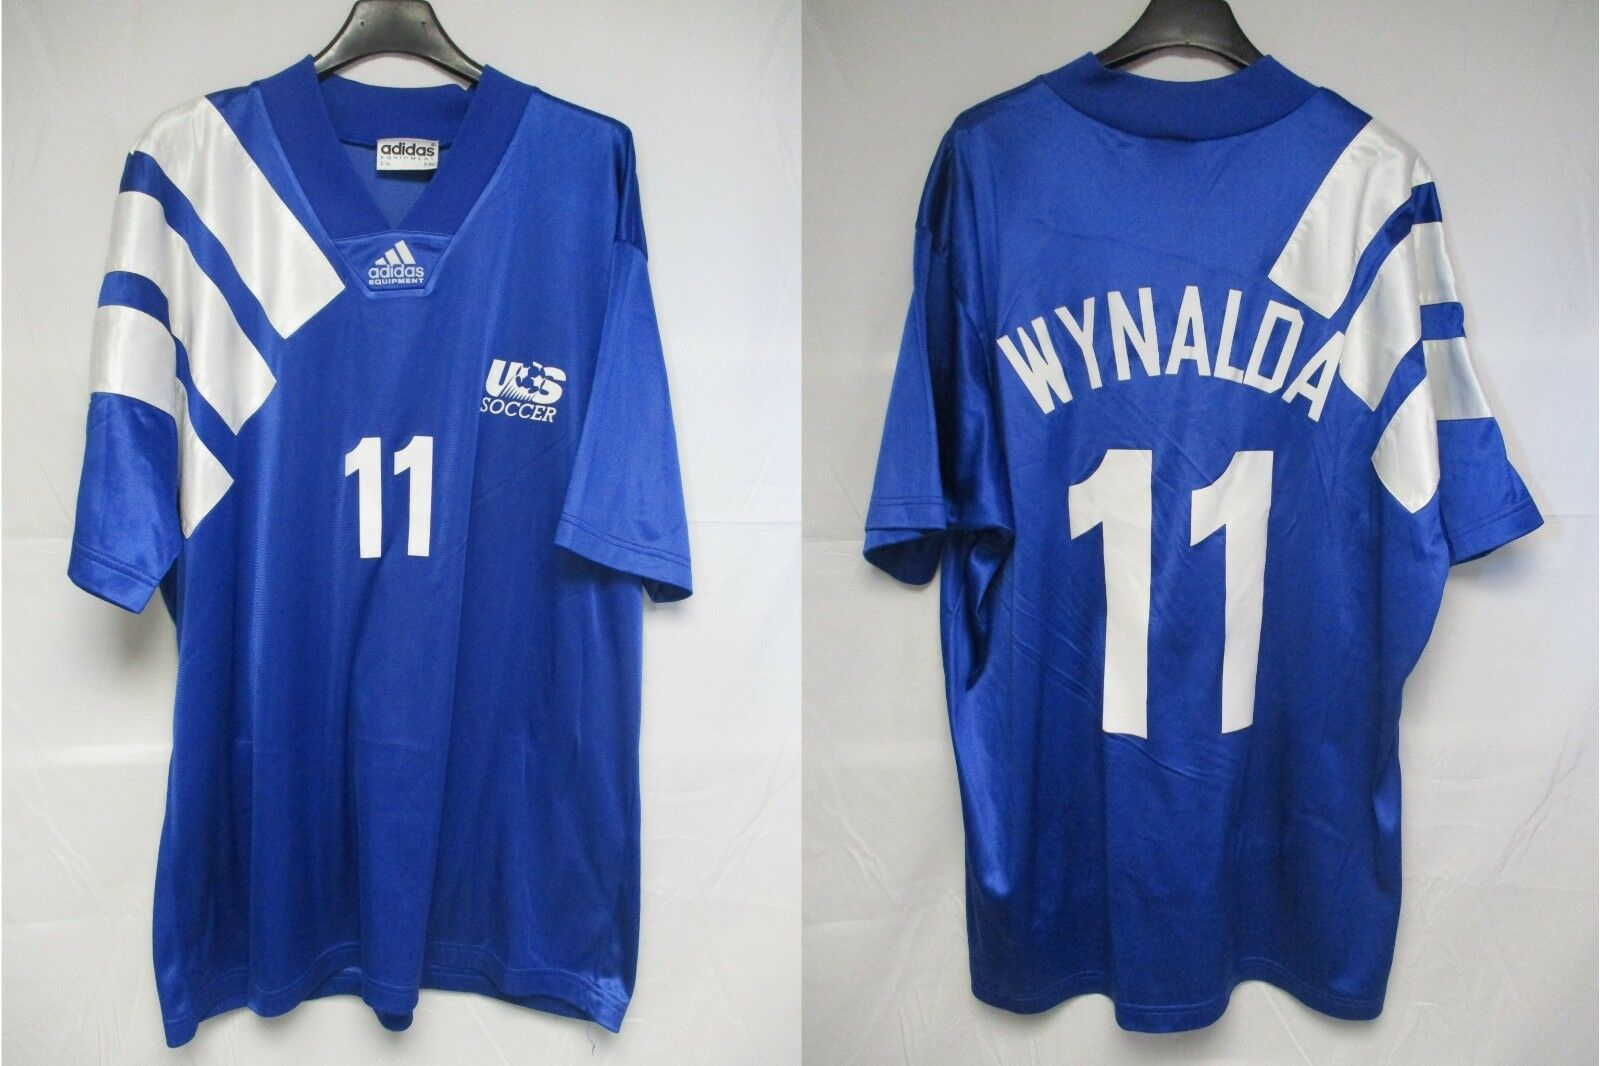 Maillot ETATS-UNIS USA Soccer vintage ADIDAS WYNALDA away shirt jersey trikot XL